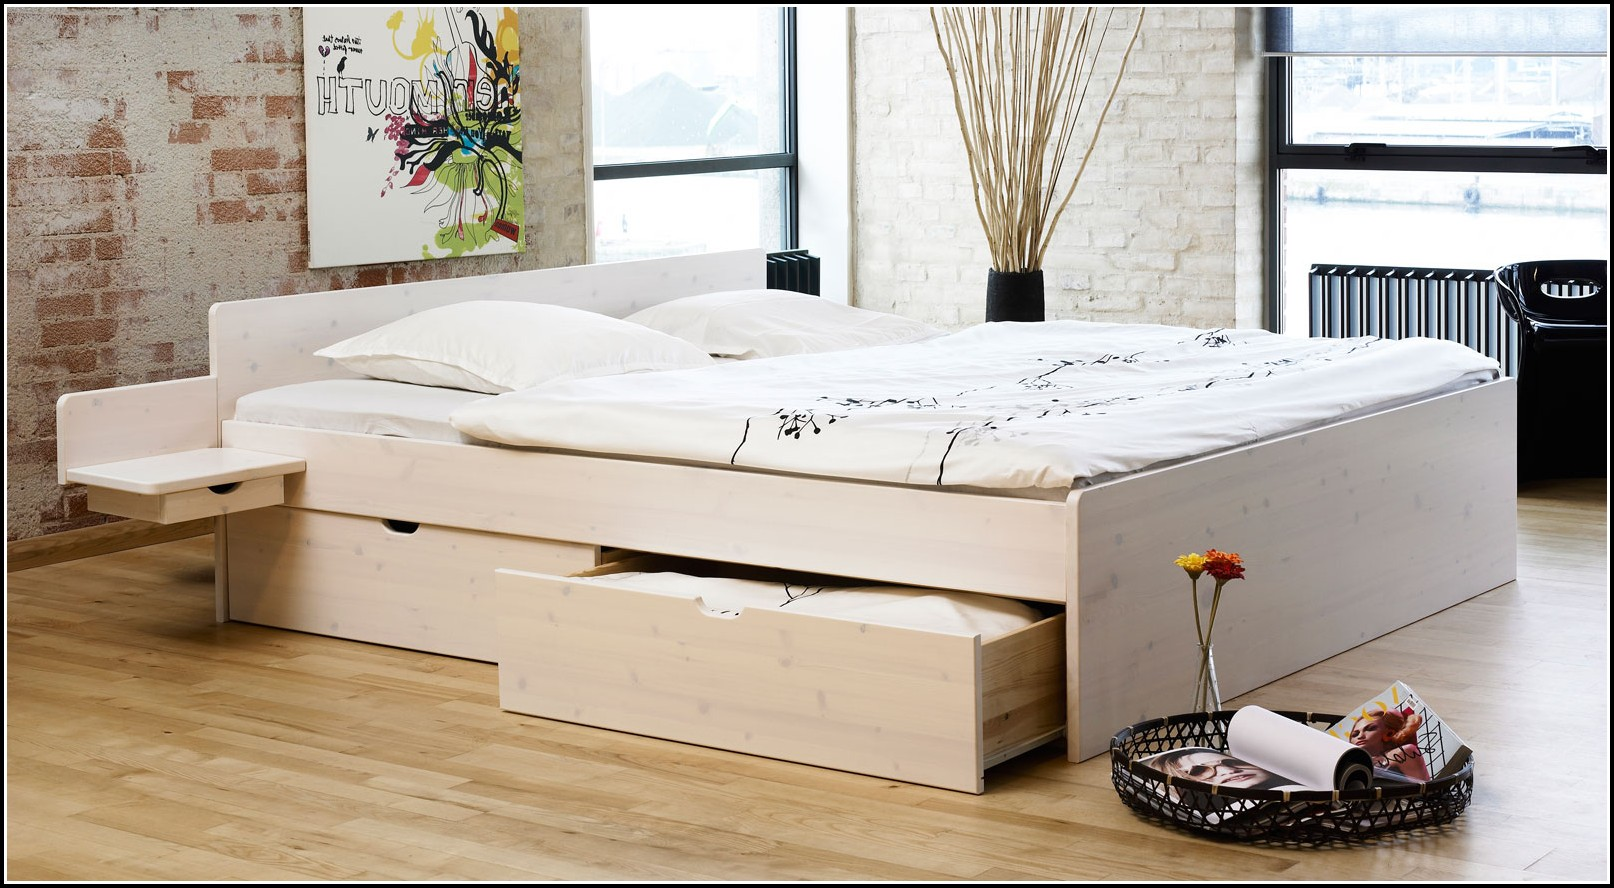 ikea bett weis holz betten house und dekor galerie 0n1xy62r7j. Black Bedroom Furniture Sets. Home Design Ideas